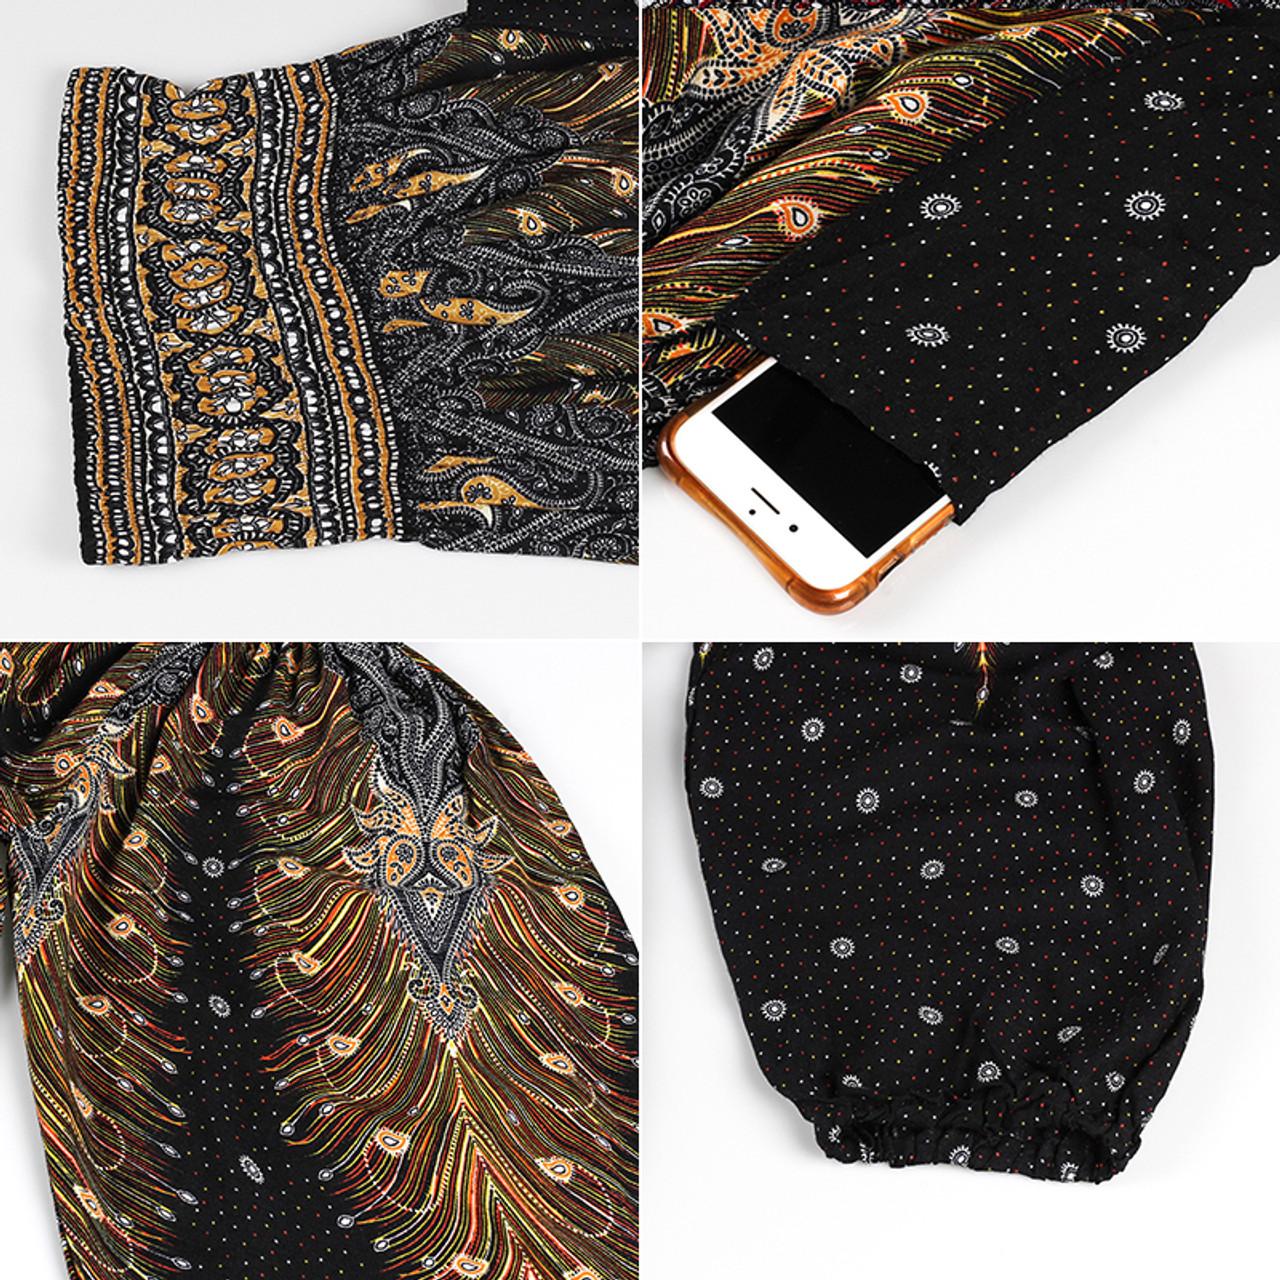 50b6795d4b2 ... CHLEISURE 10 Colors Summer Beach Bohemian Pants Women High Waist Harem  Pants Plus Size Loose Print ...